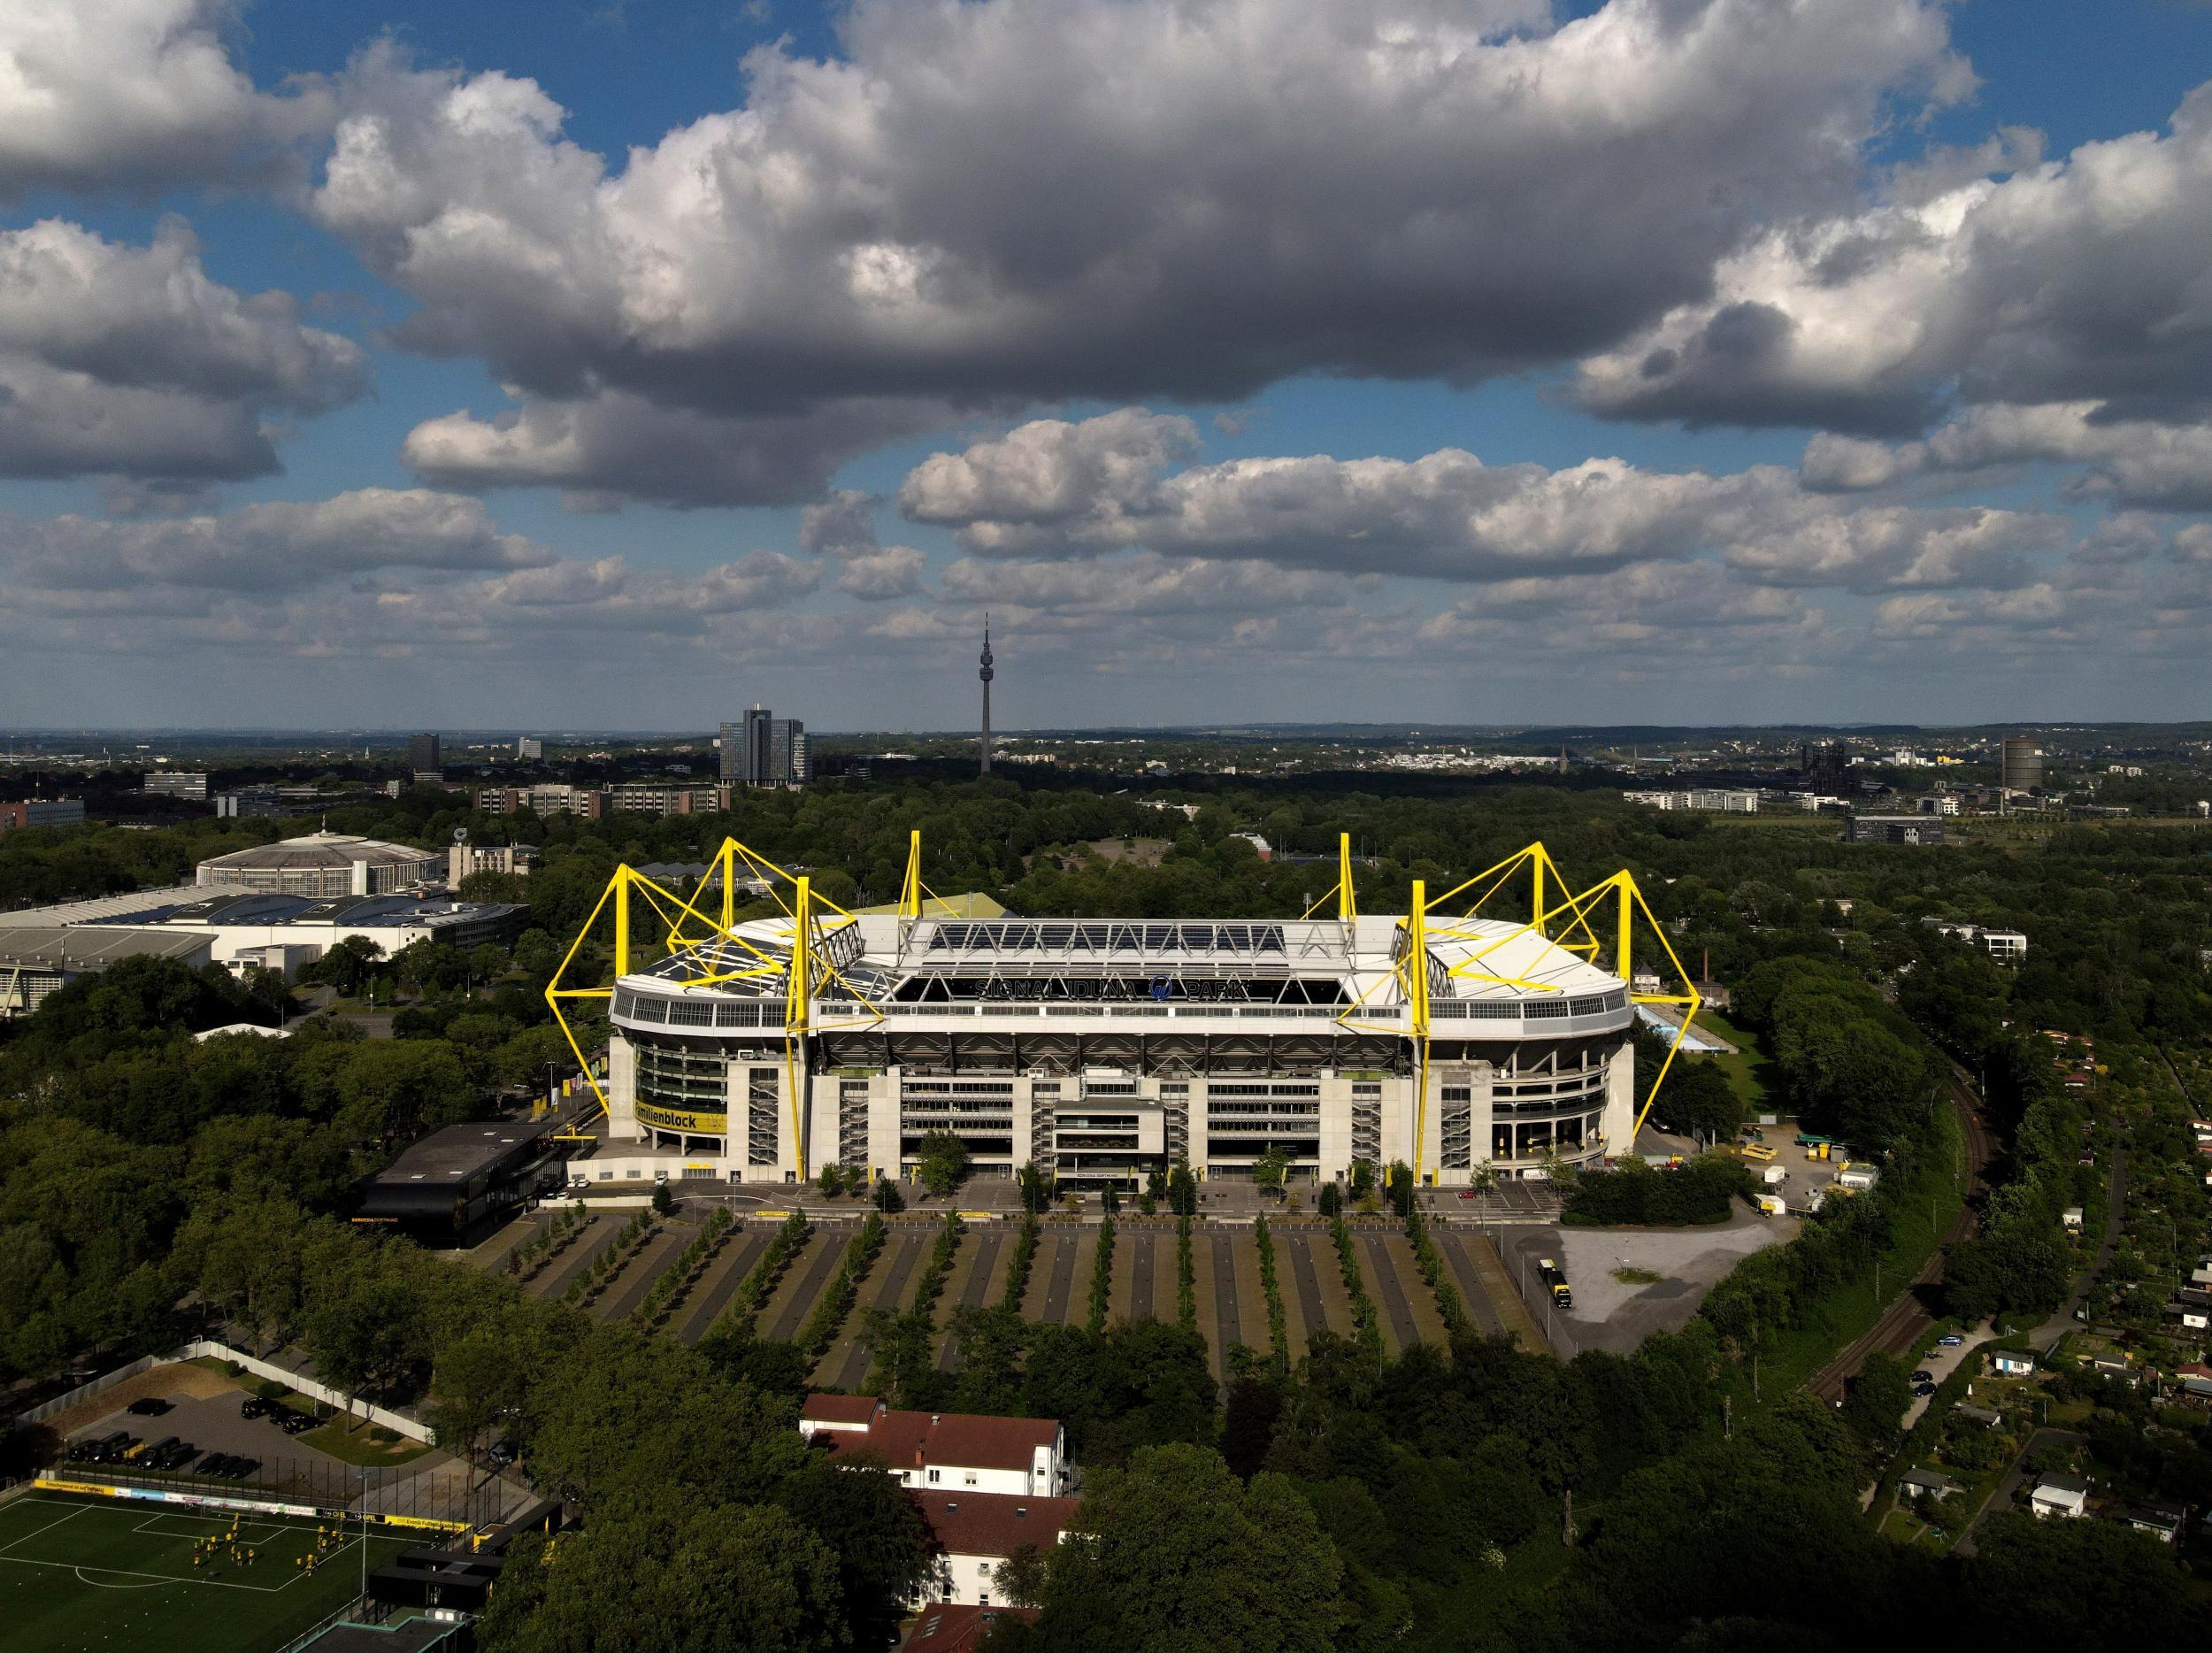 Borussia Dortmund vs Bayern Munich LIVE: Team news and line-ups ahead of Bundesliga fixture today